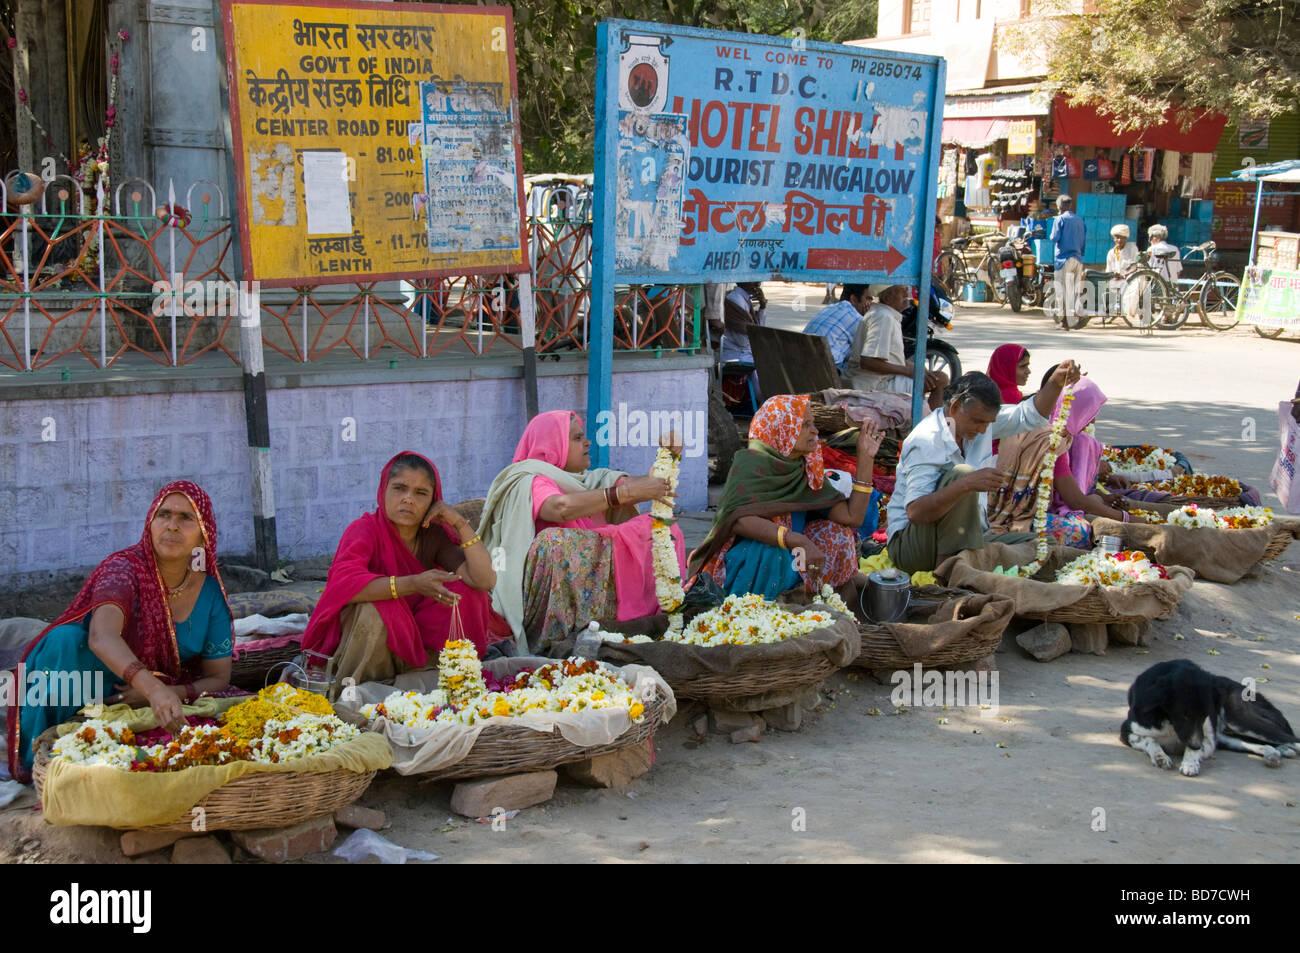 Indian Market Indian Market Day Scen...